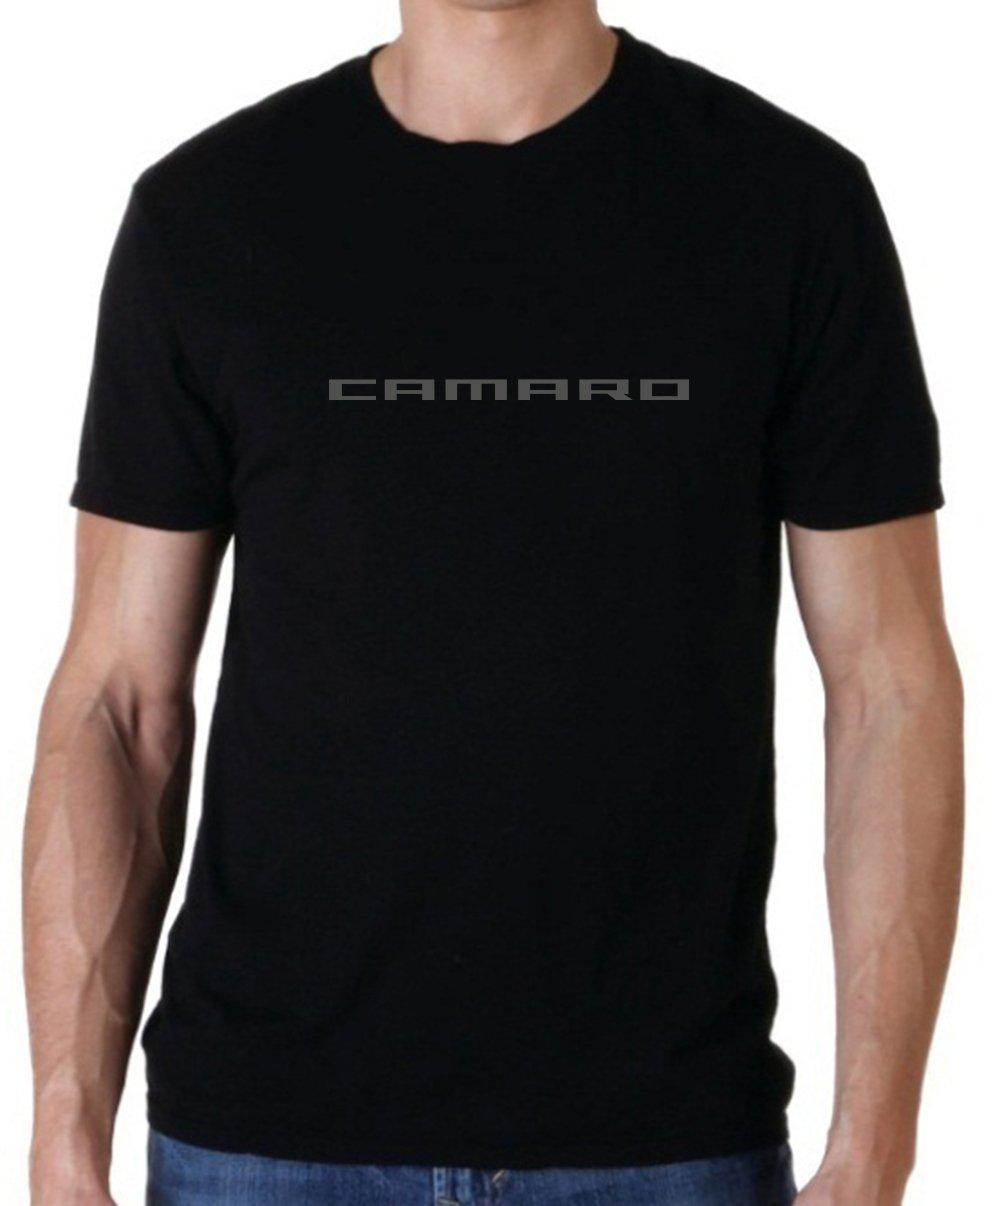 Uzair Chevy Camaro Emblem Hoodie & T-Shirt (Black T-Shirt, Medium)